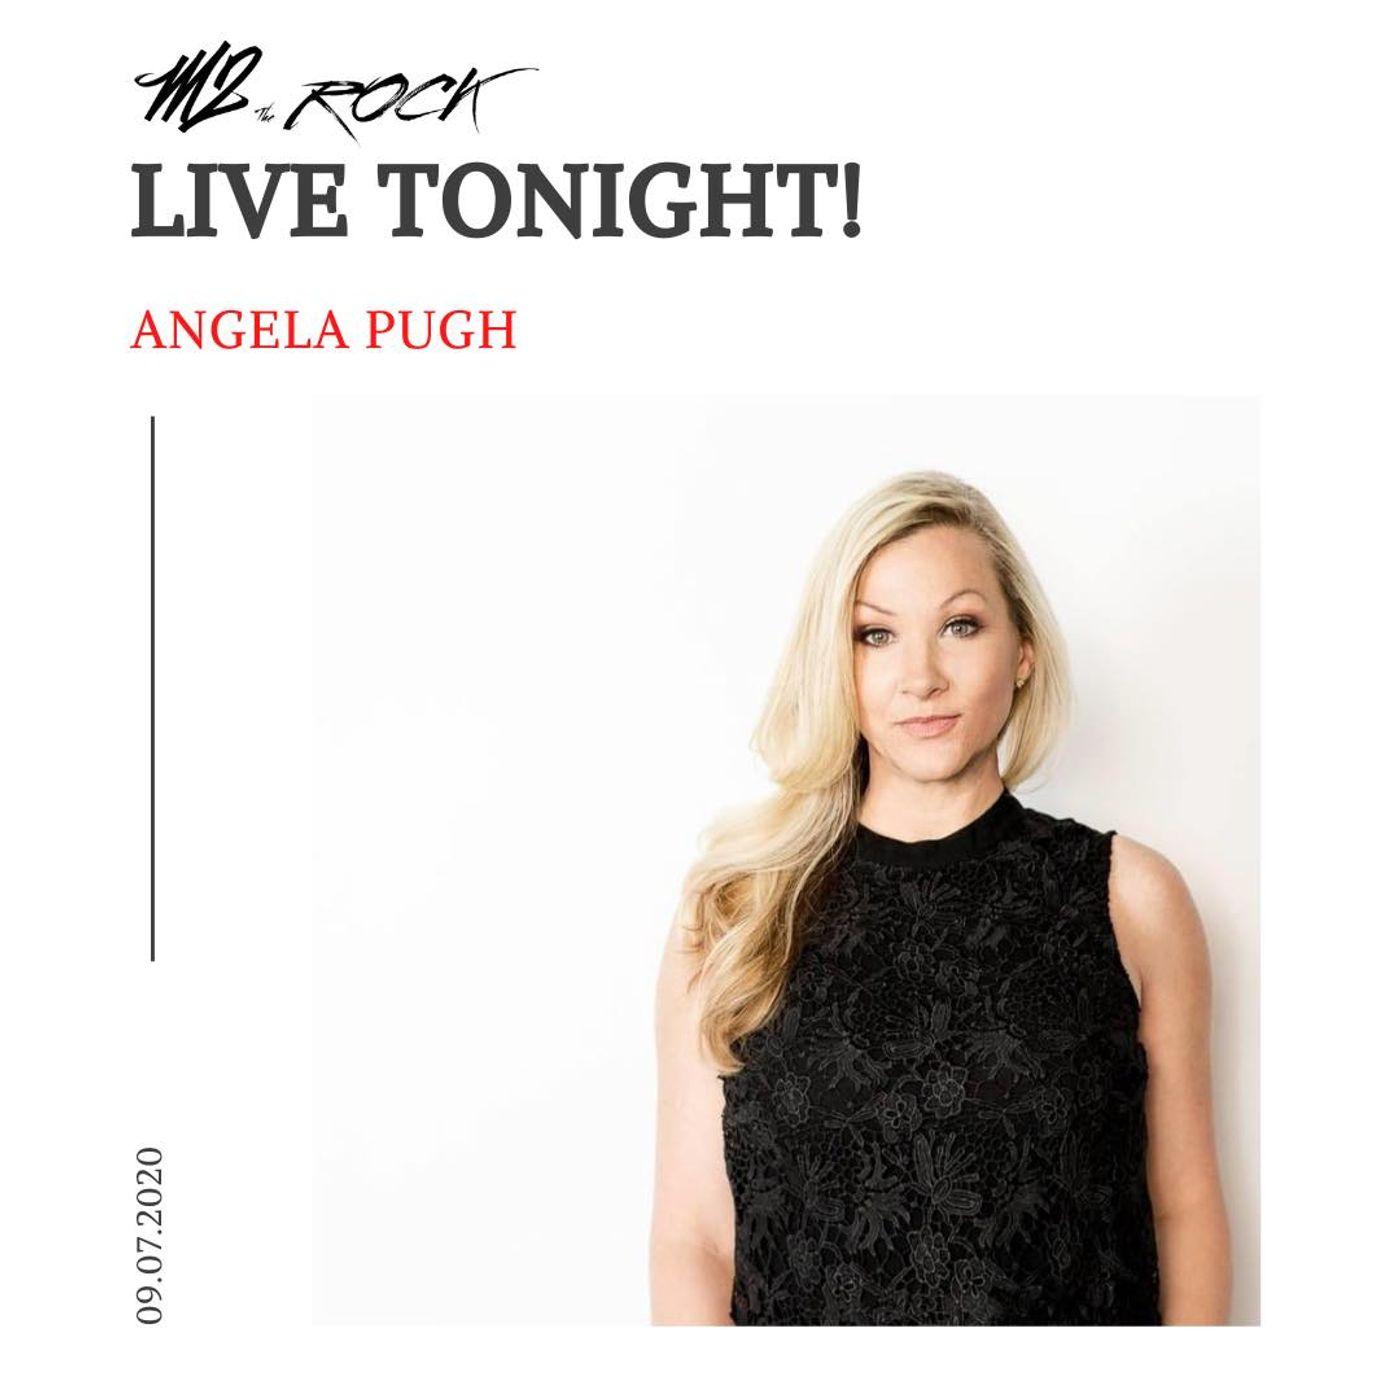 ANGELA PUGH - ADDICTION UNLIMITED LIVE on M2 THE ROCK